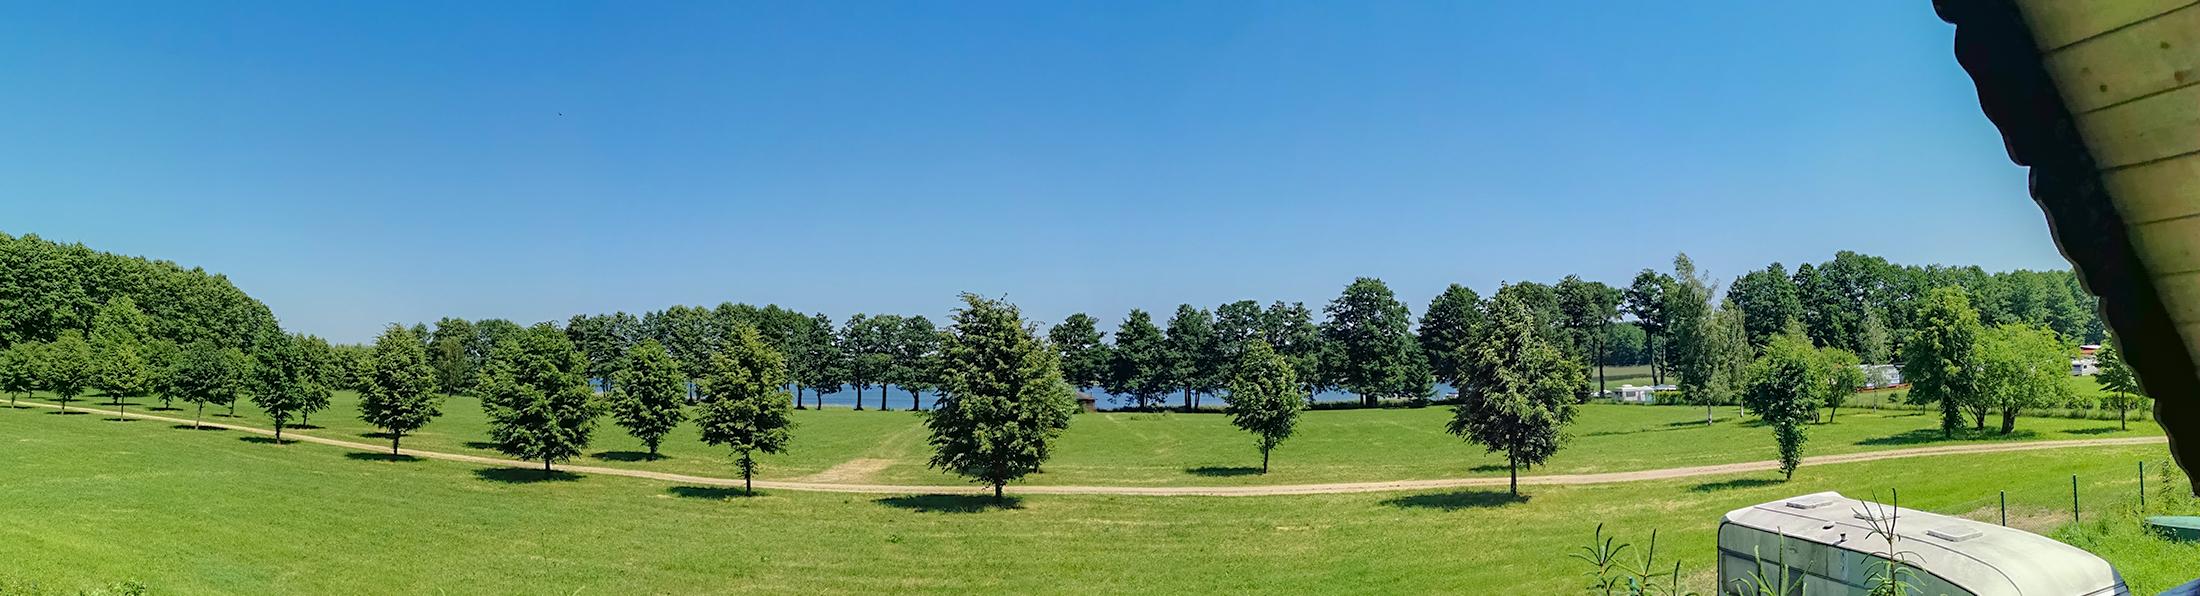 Noclegi nad jeziorem, Studio nad jeziorem Kirsajty